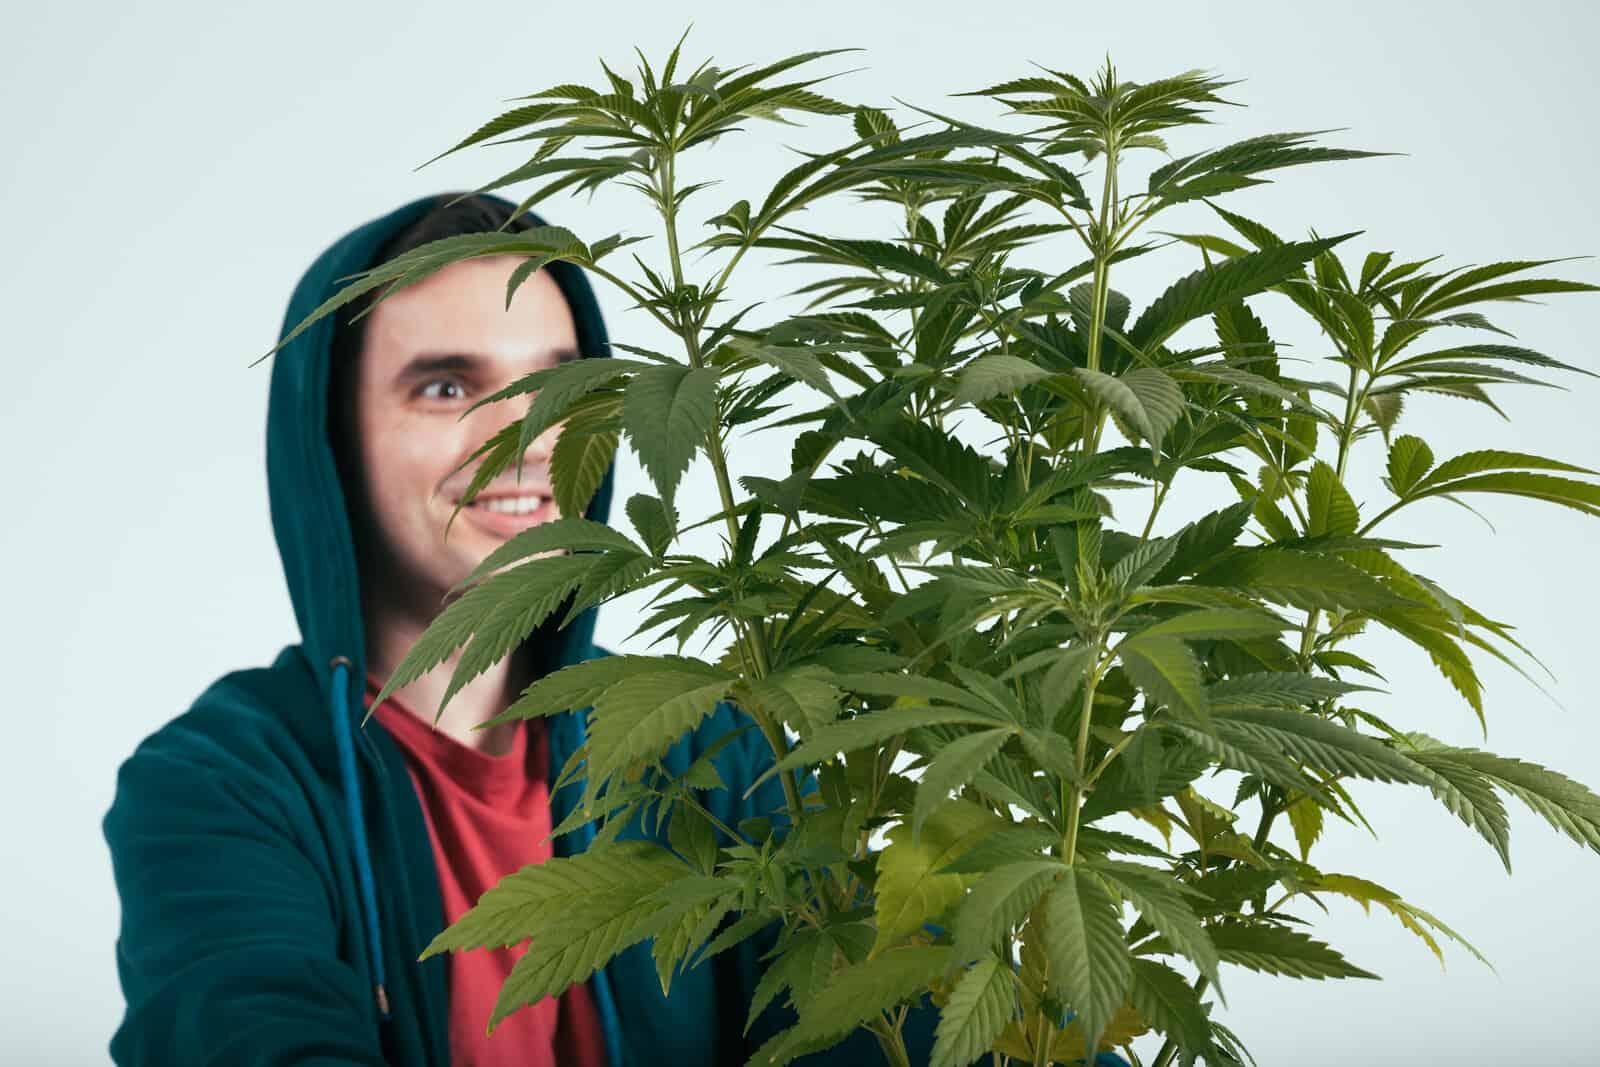 Marijuana Plant Growth Cycle Stages. Man happy with marijuana plant.